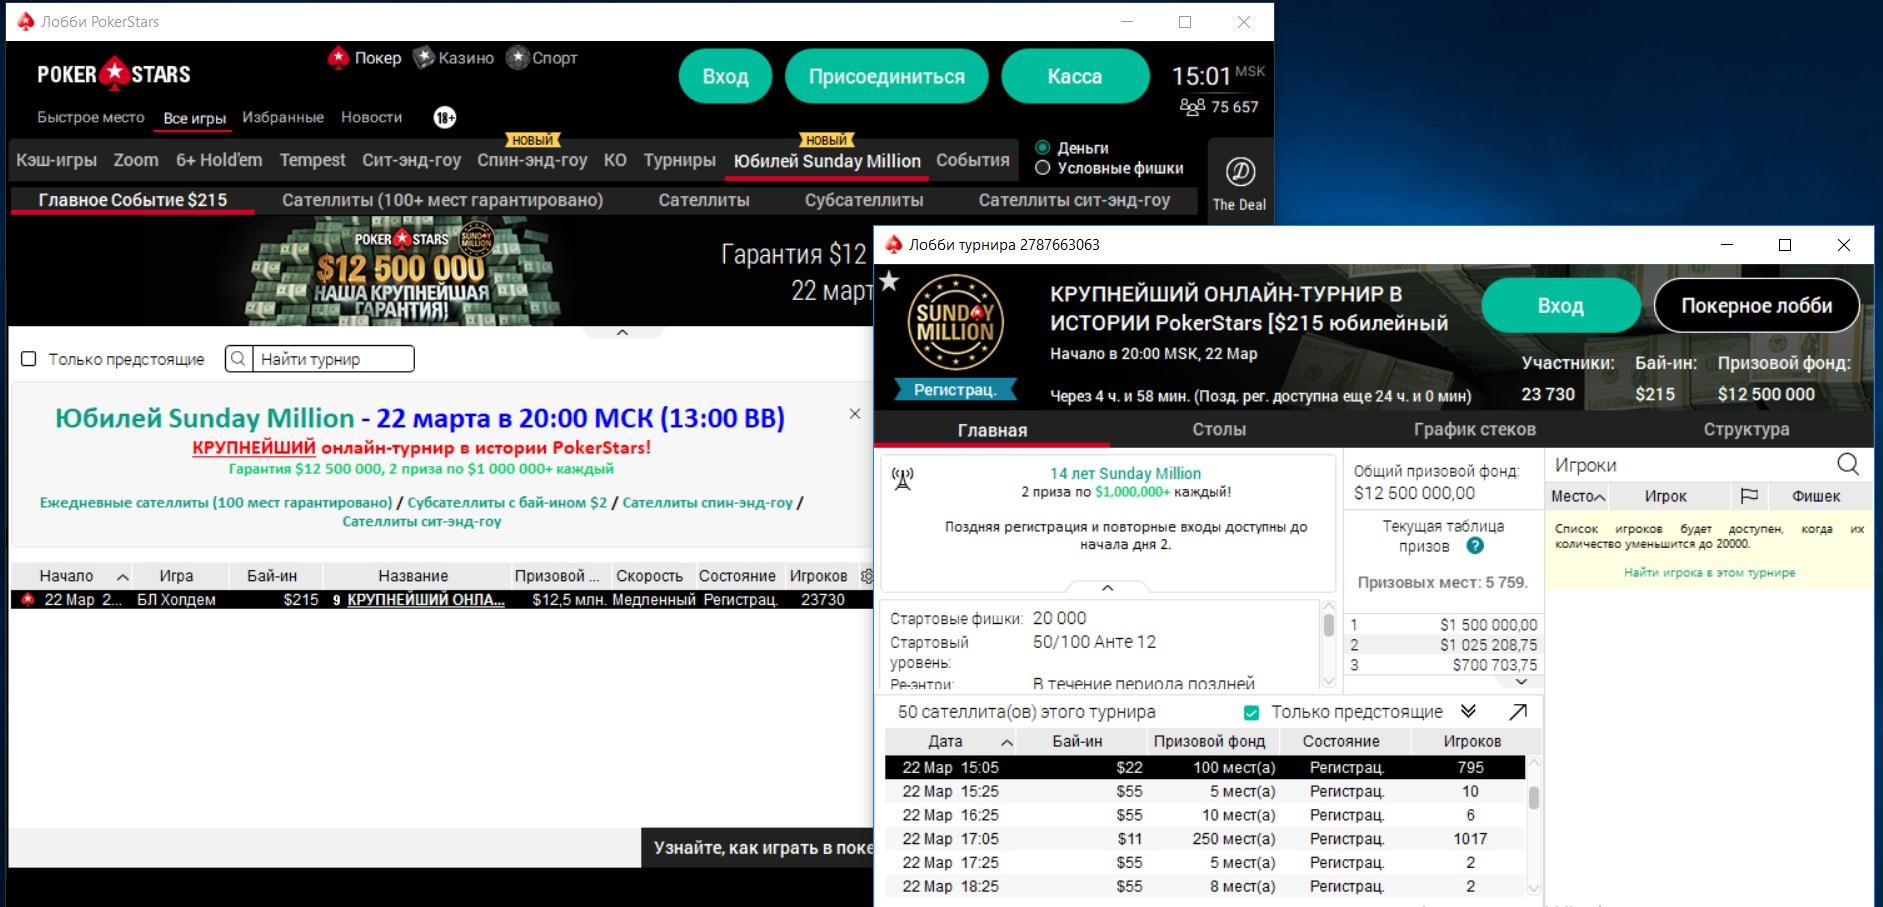 Sunday Million в лобби ПокерСтарс 2020